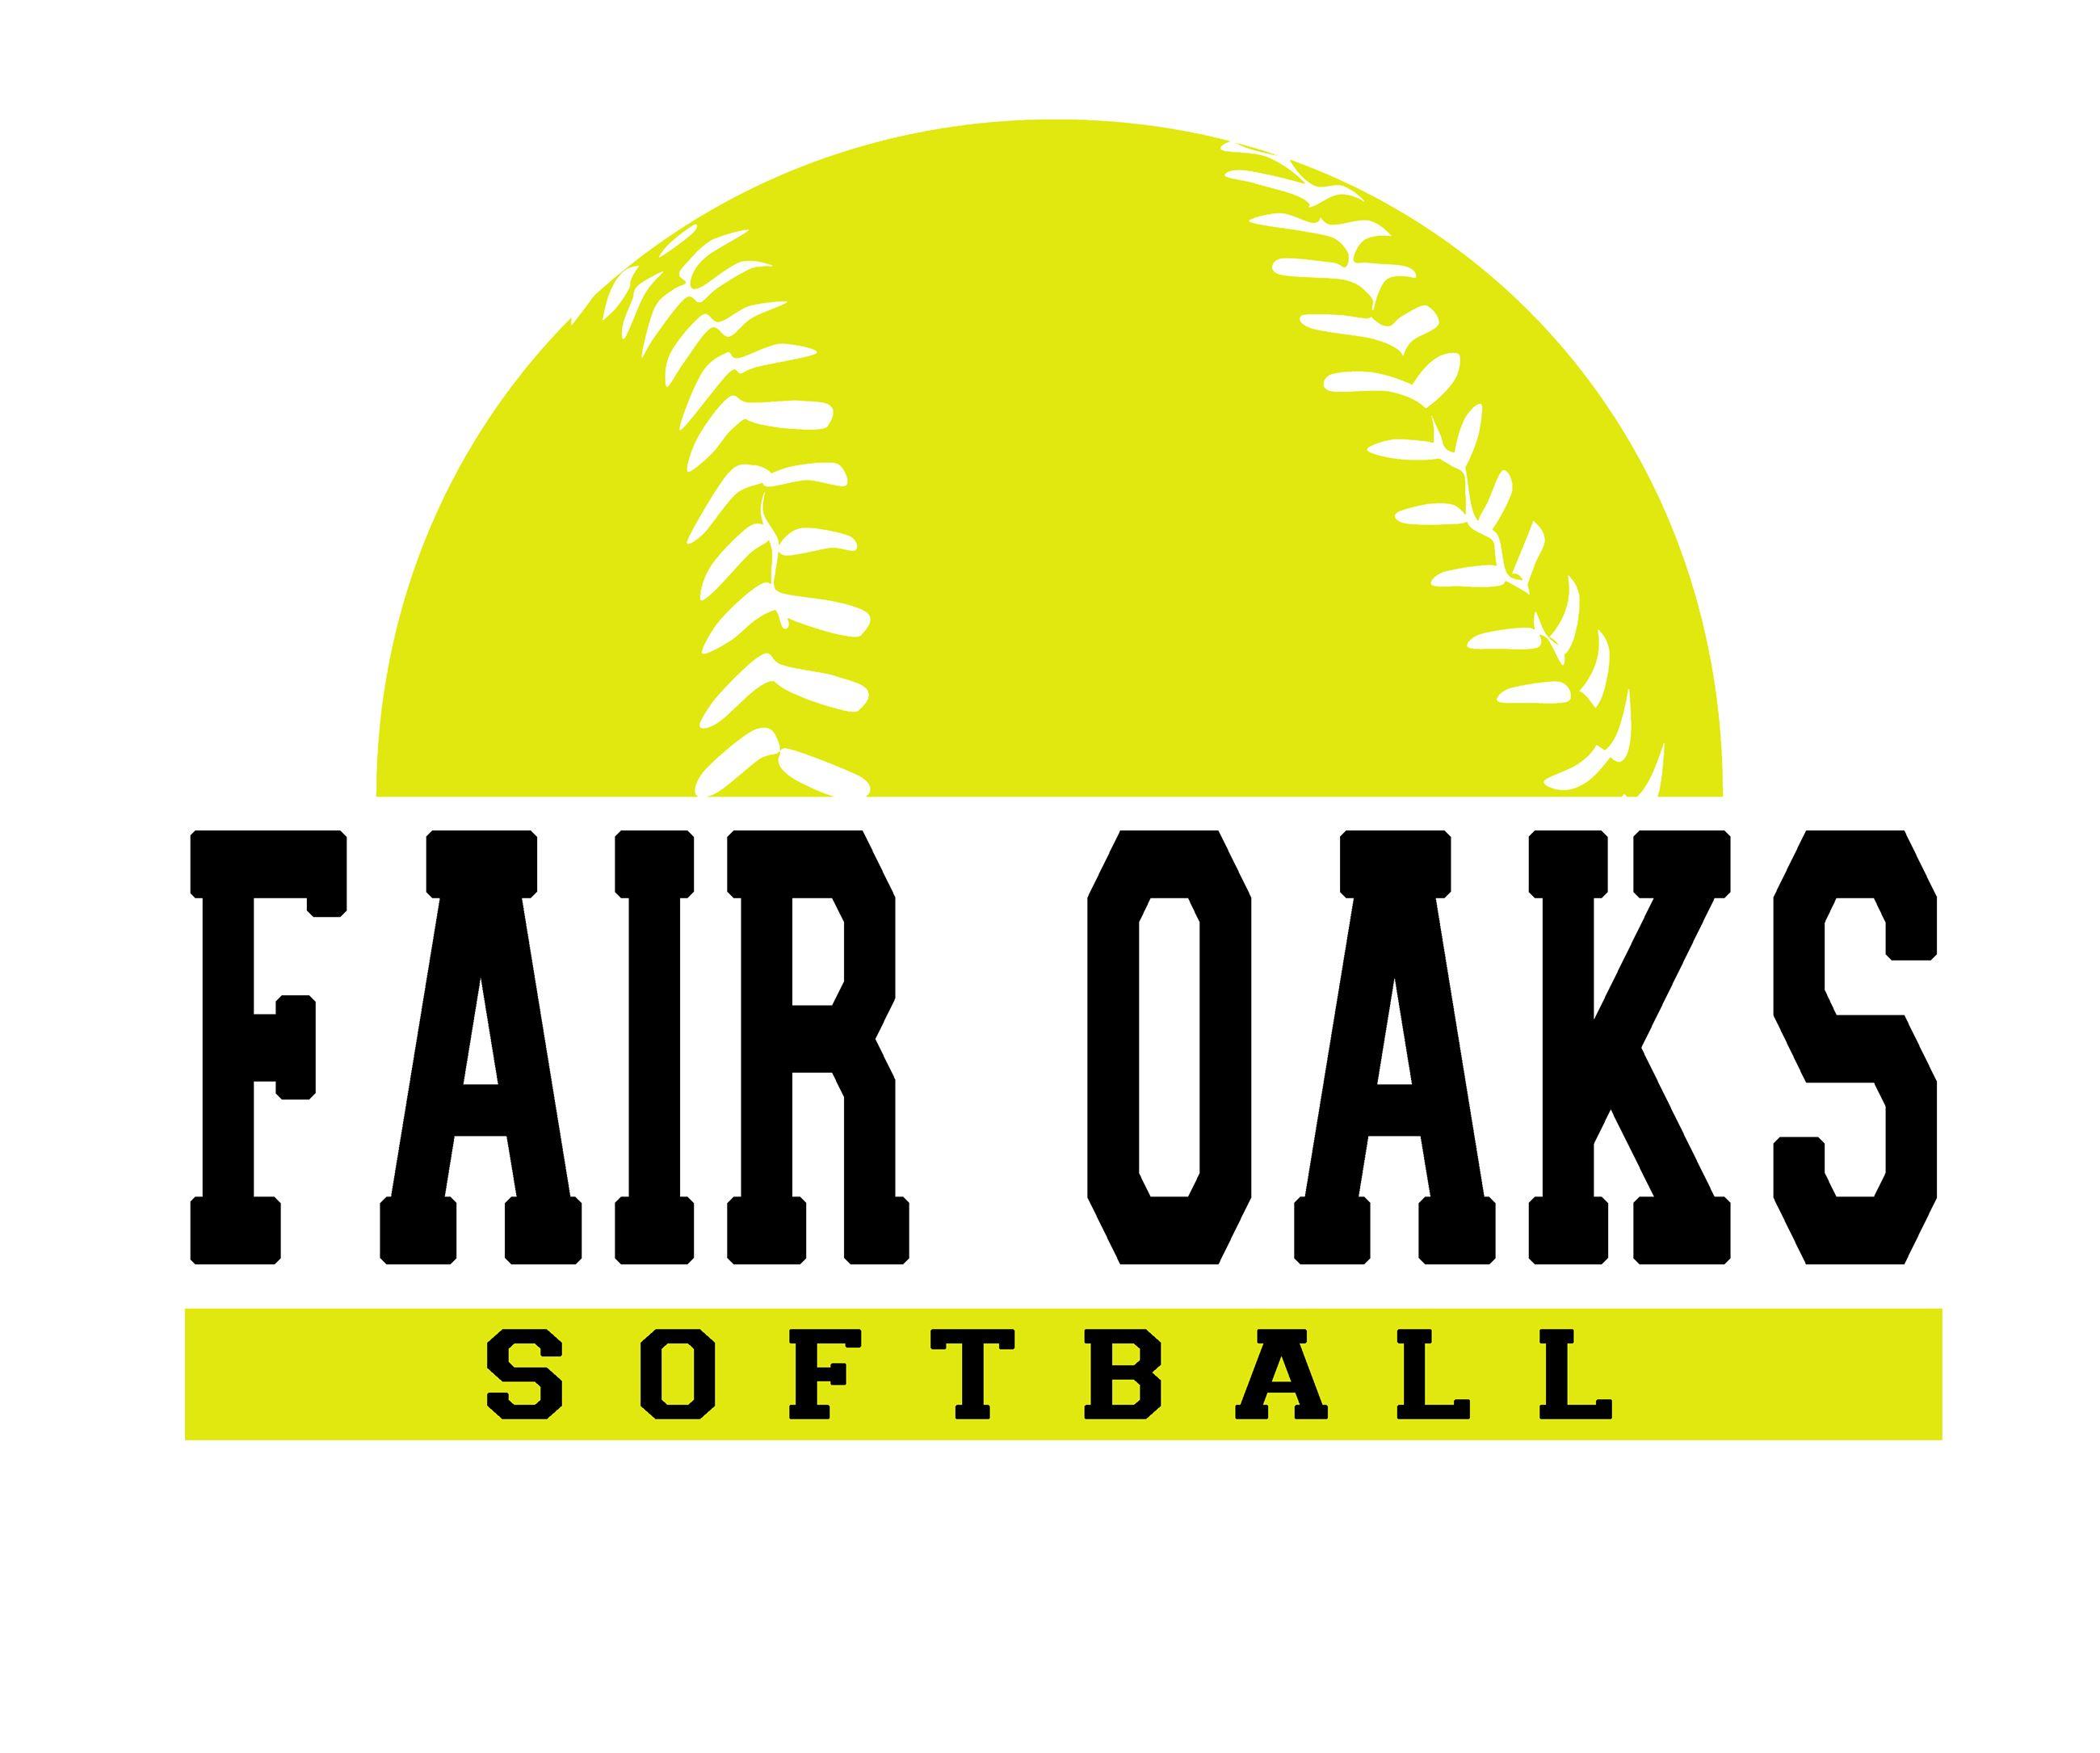 FORPD Softball Logo